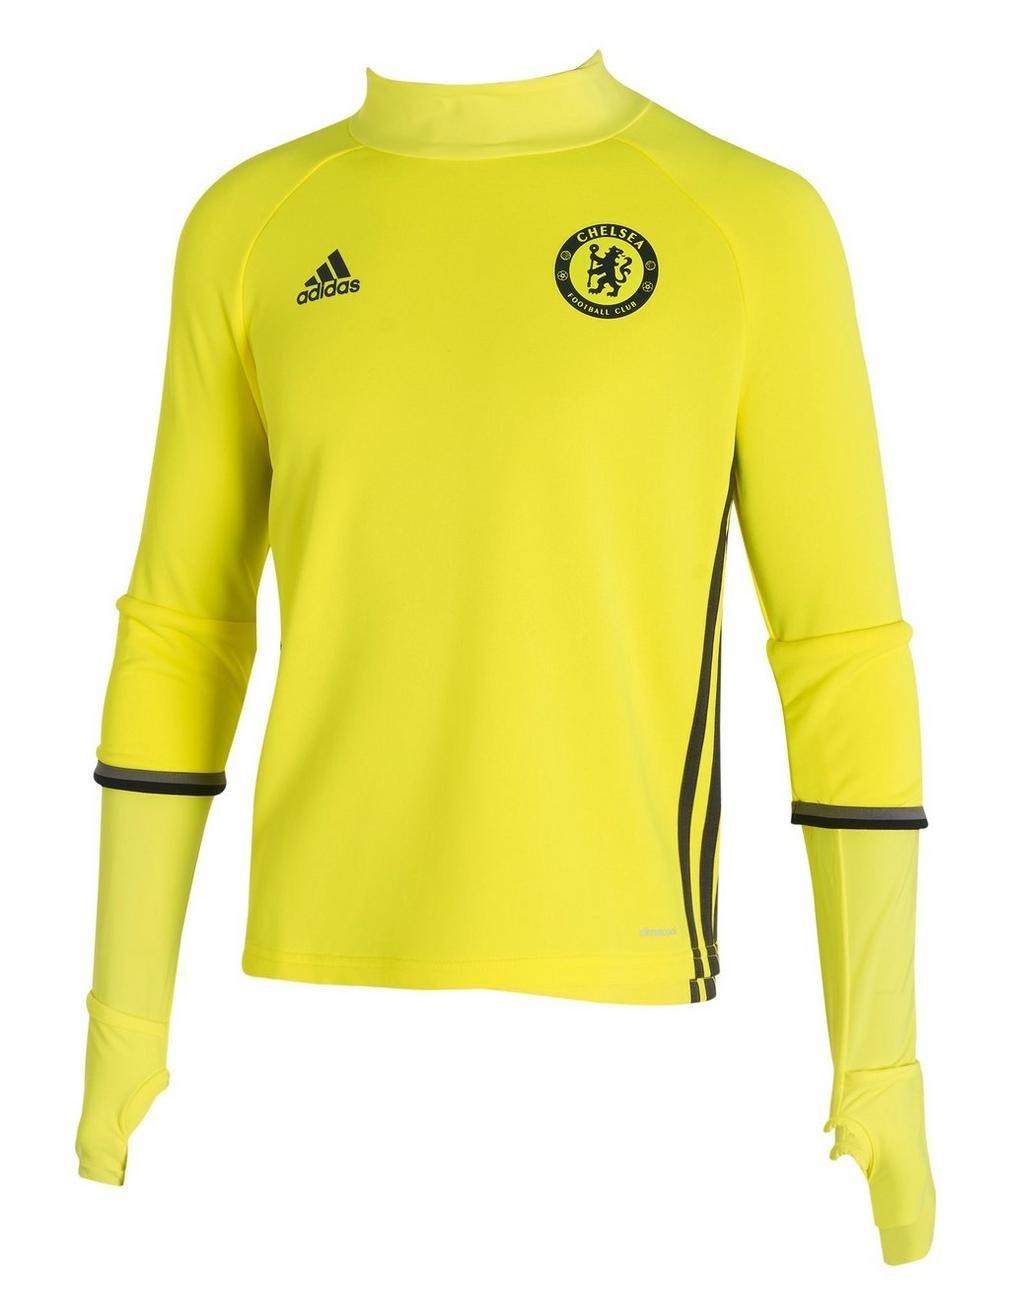 2016-2017 Chelsea Adidas Training Top (Yellow) Kids B01HUVJ6COYellow Small Boys 26-28\